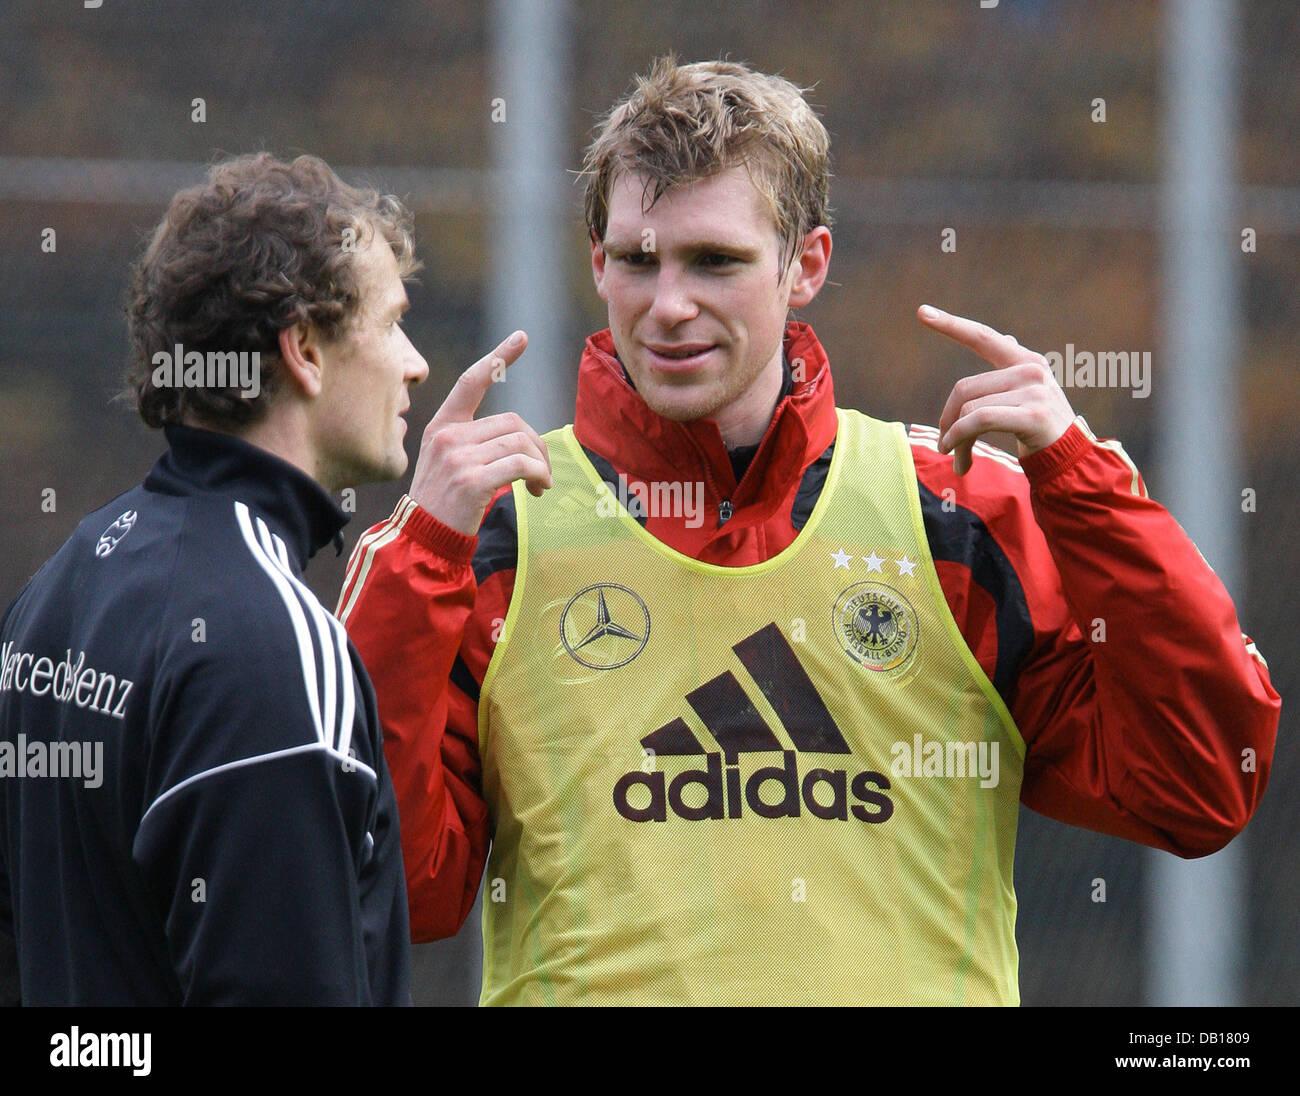 Player of the German national soccer team, Per Mertesacker, talks to goalkeeper Jens Lehmann (L) during team practice Stock Photo